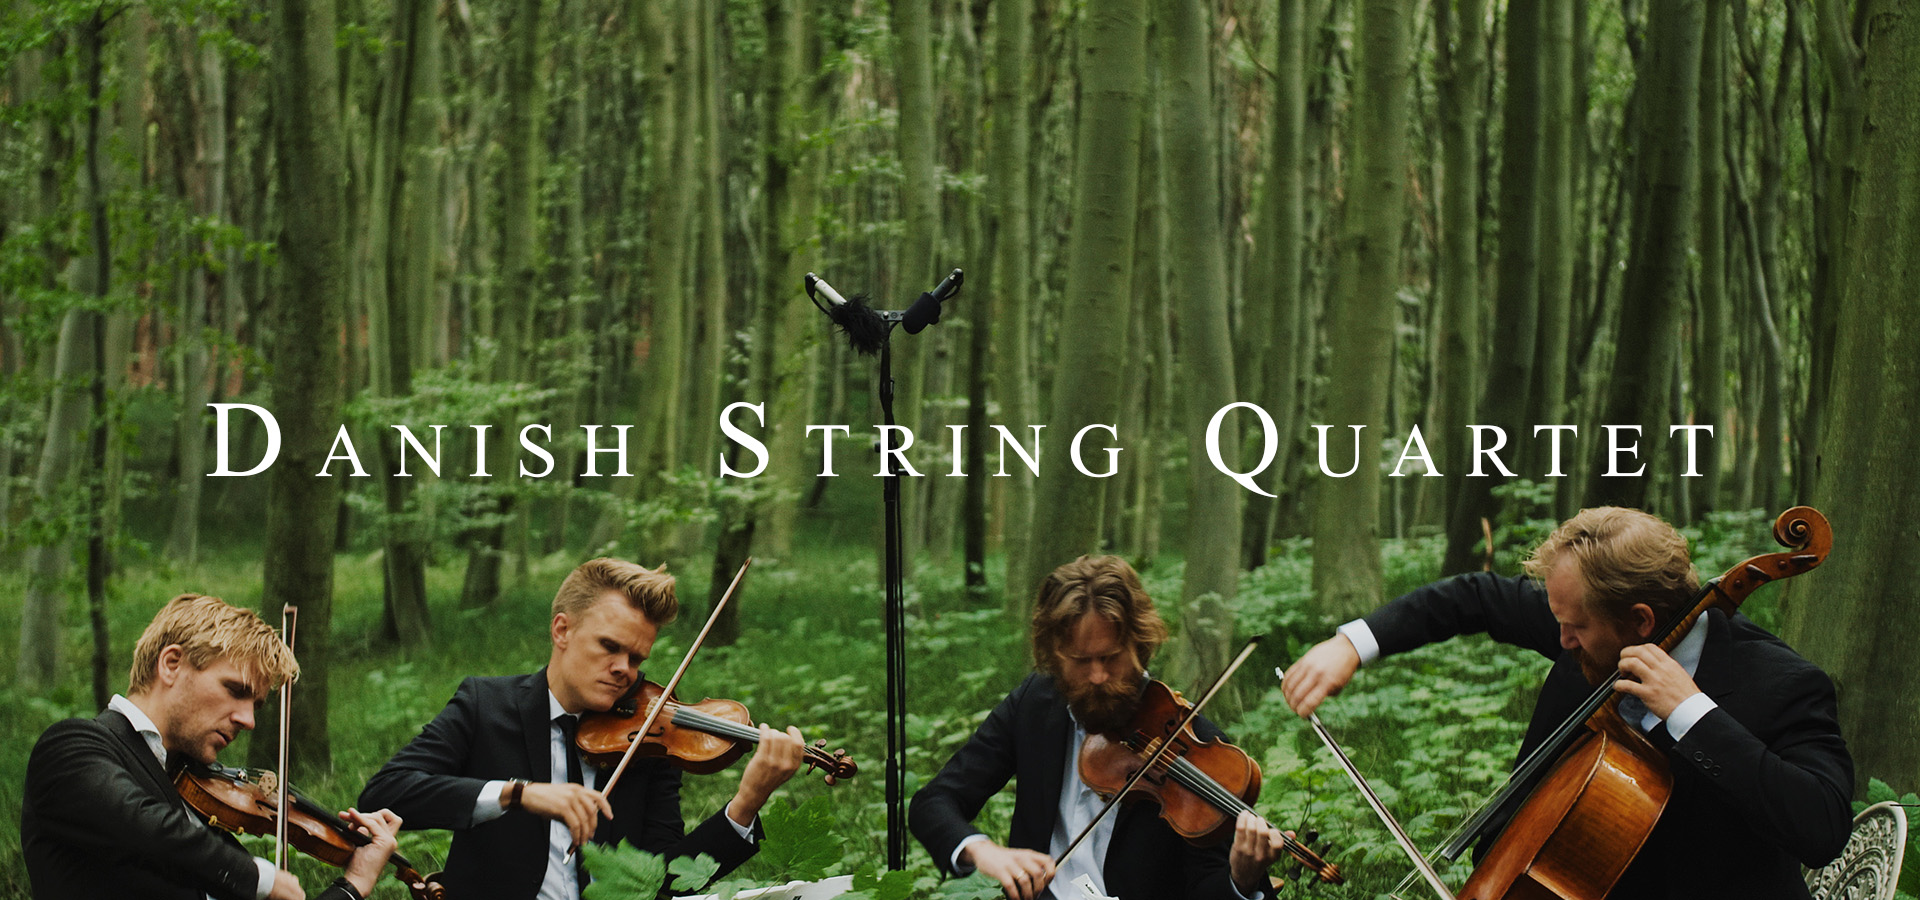 "<a href=""http://www.moensessions.com/2019/11/30/danish-string-quartet/"">September 2019</a>"